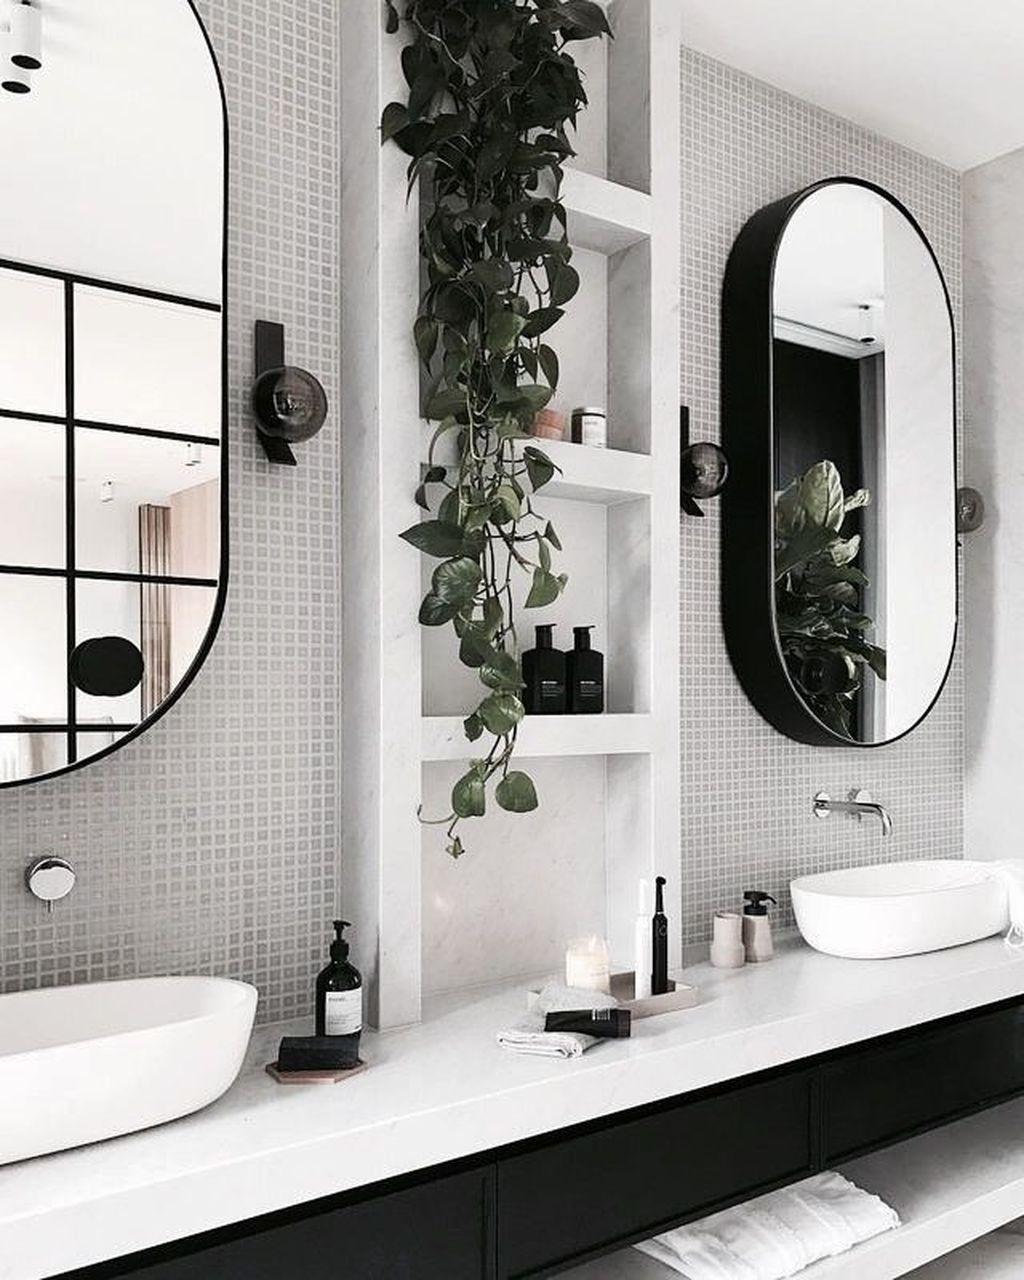 Cool 30 Amazing Bathroom Design Ideas With Black And White Bathroom Inspiration Trendy Bathroom Bathroom Design Small bathroom mobile home bathroom